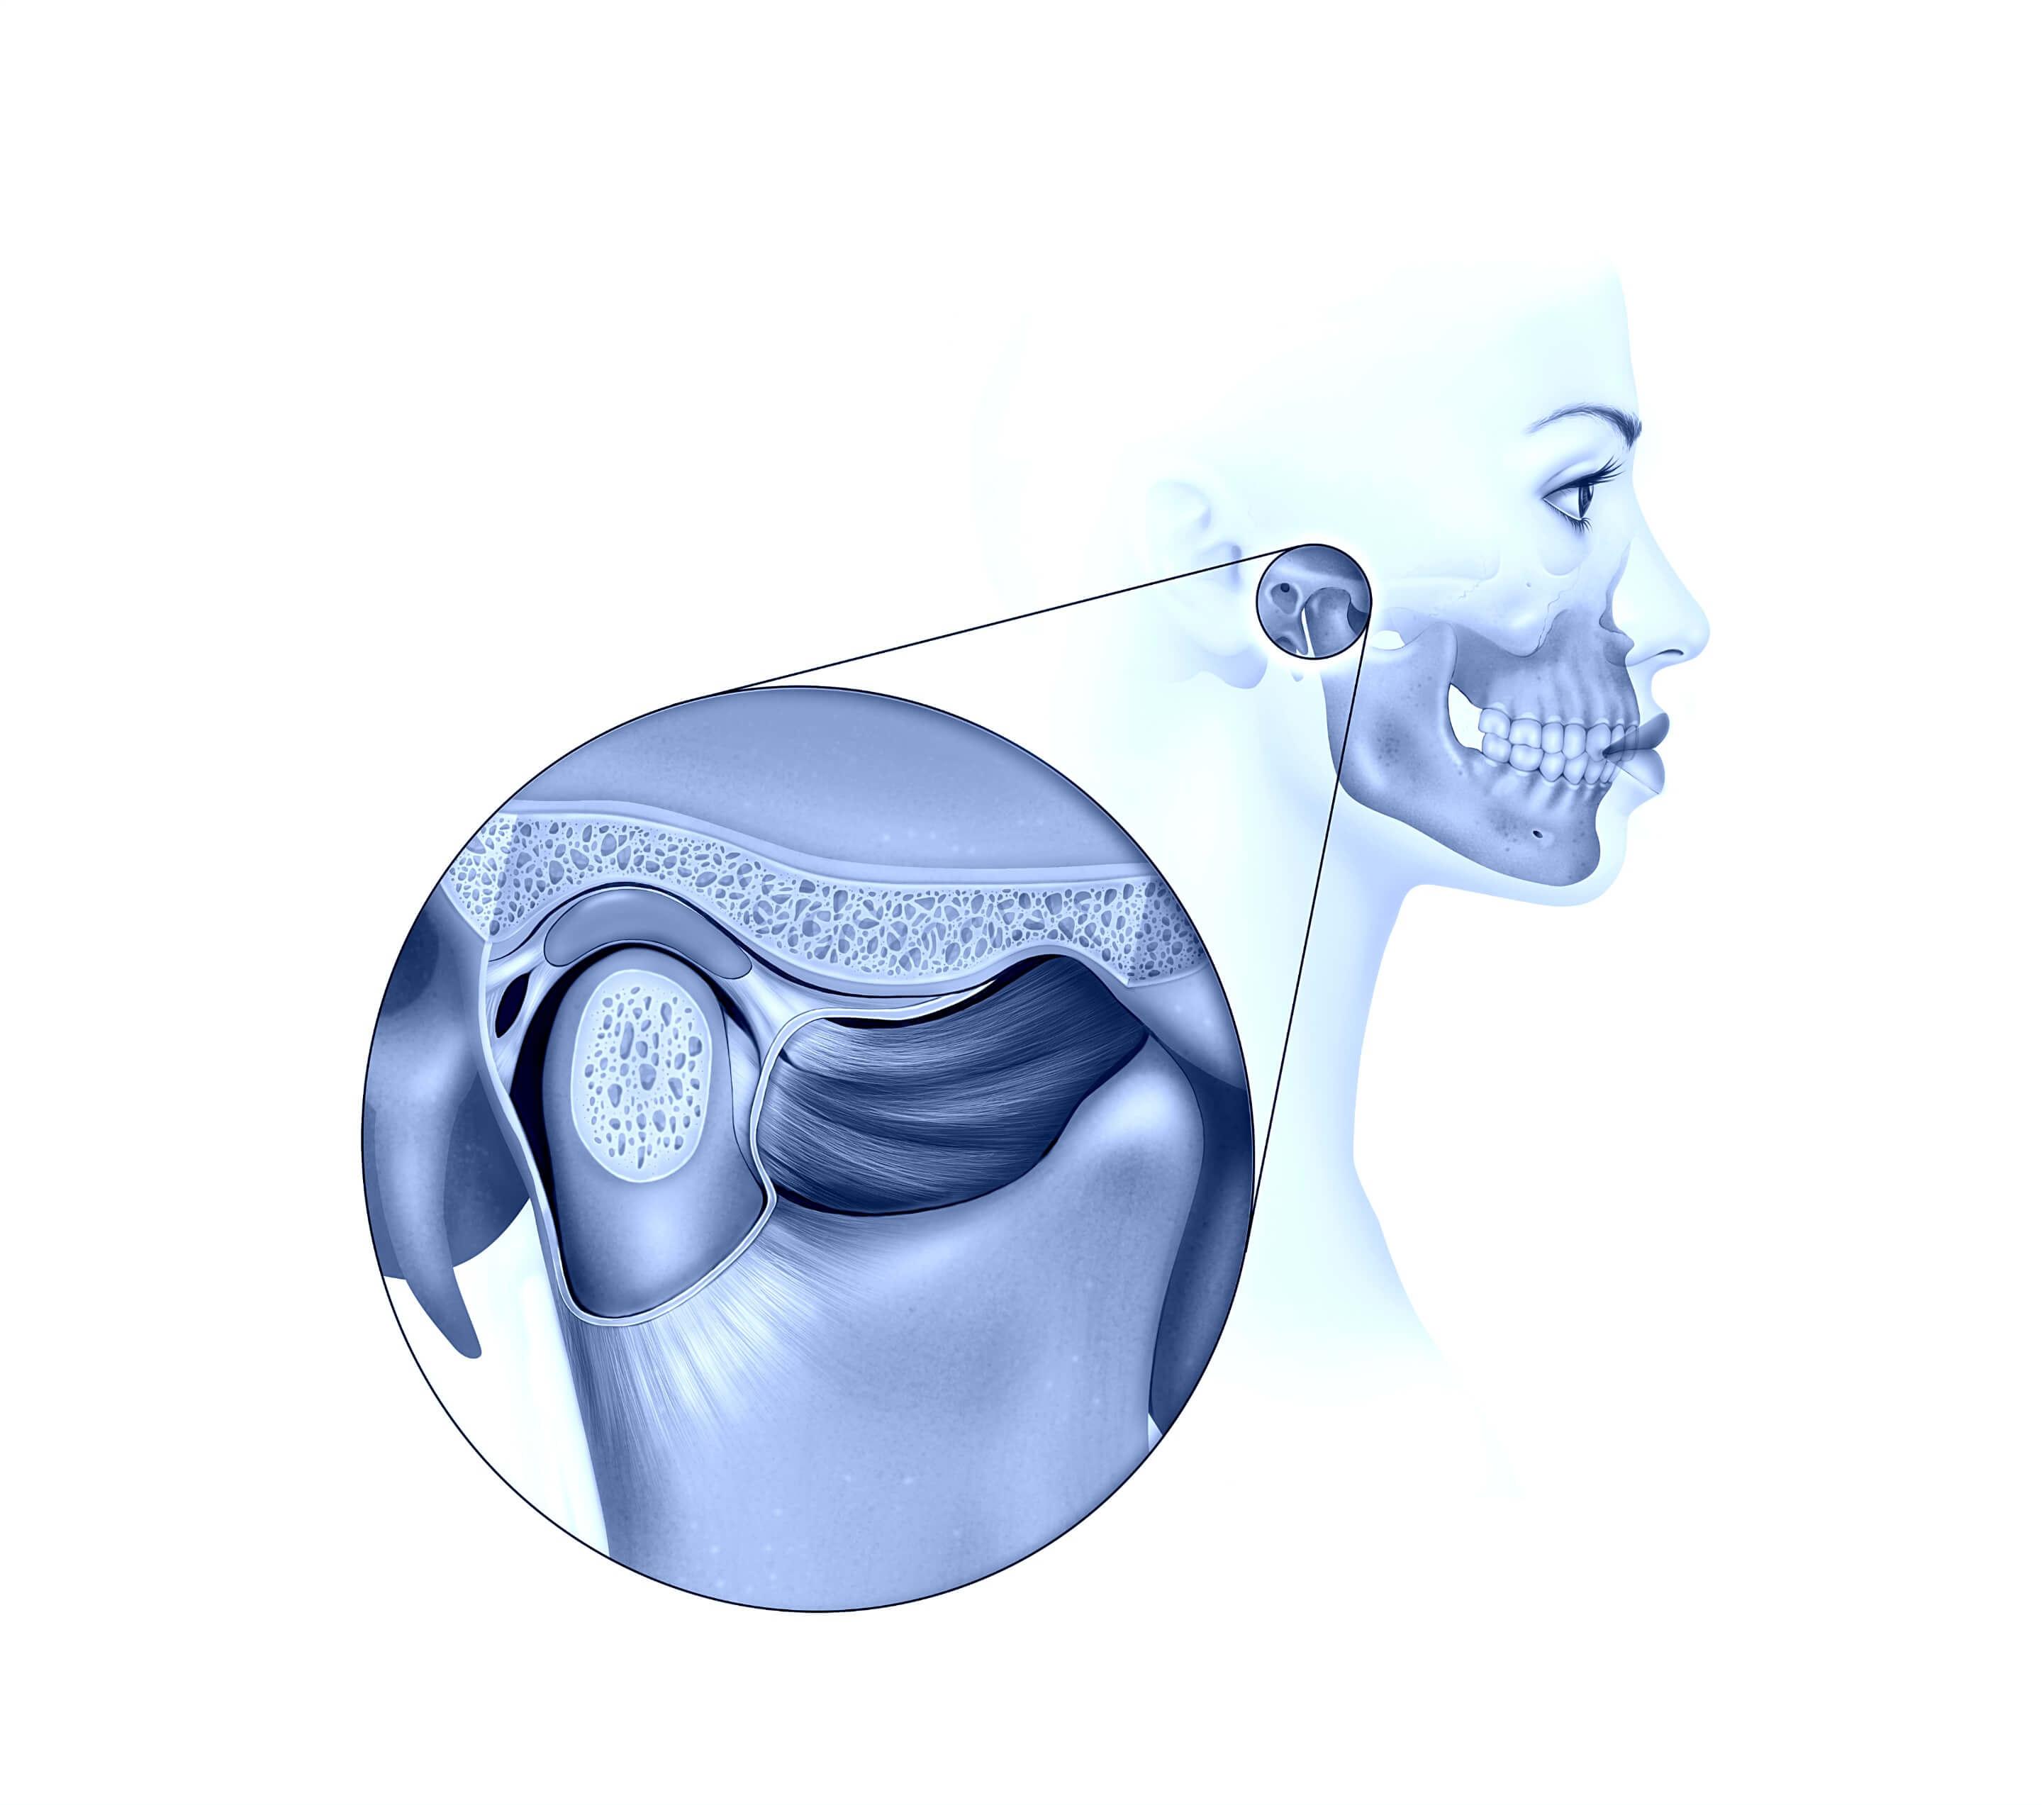 Articulación Temporomandibular - Cirugía Oral y Maxilofacial